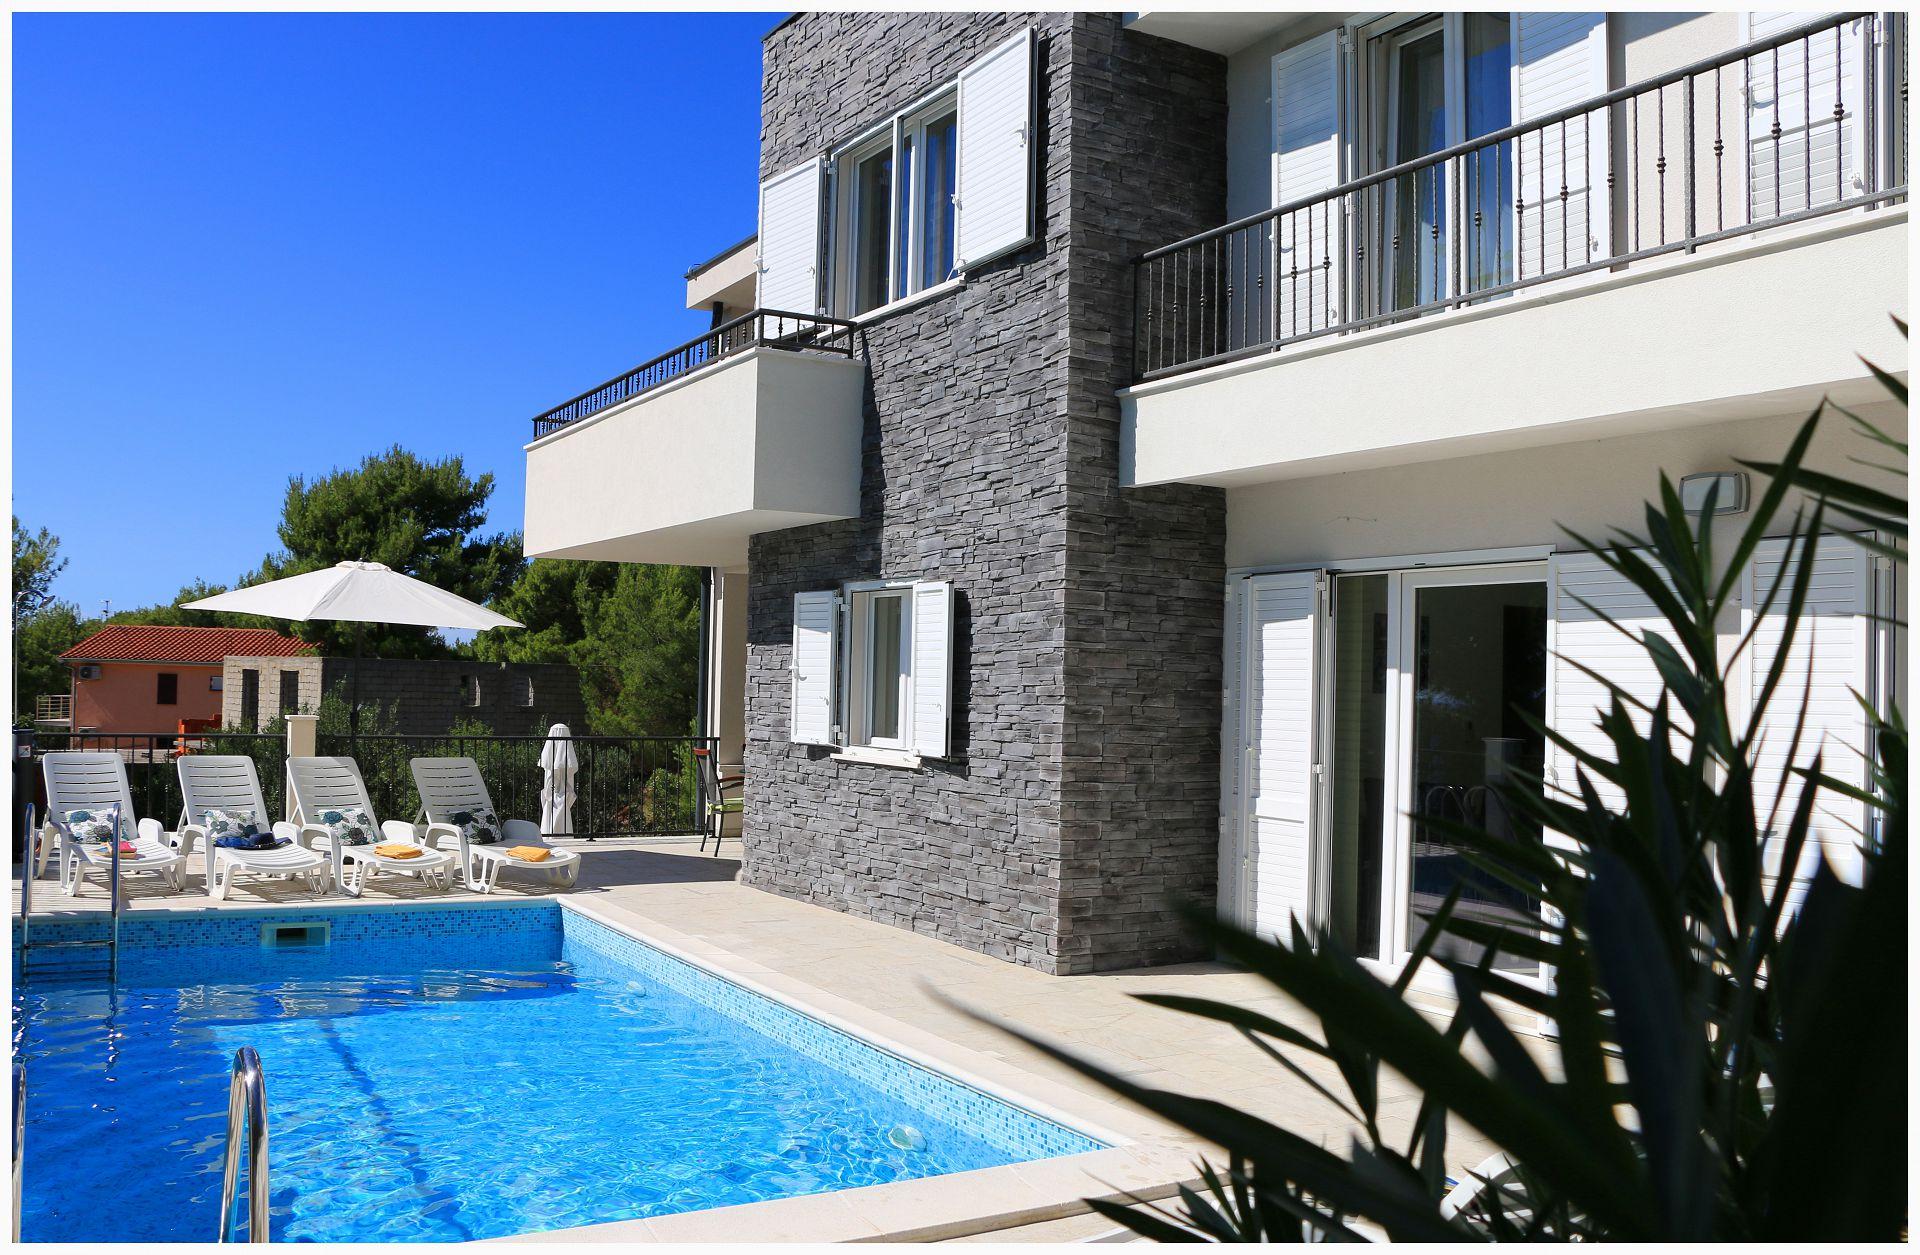 35302 - Primosten - Apartments Croatia